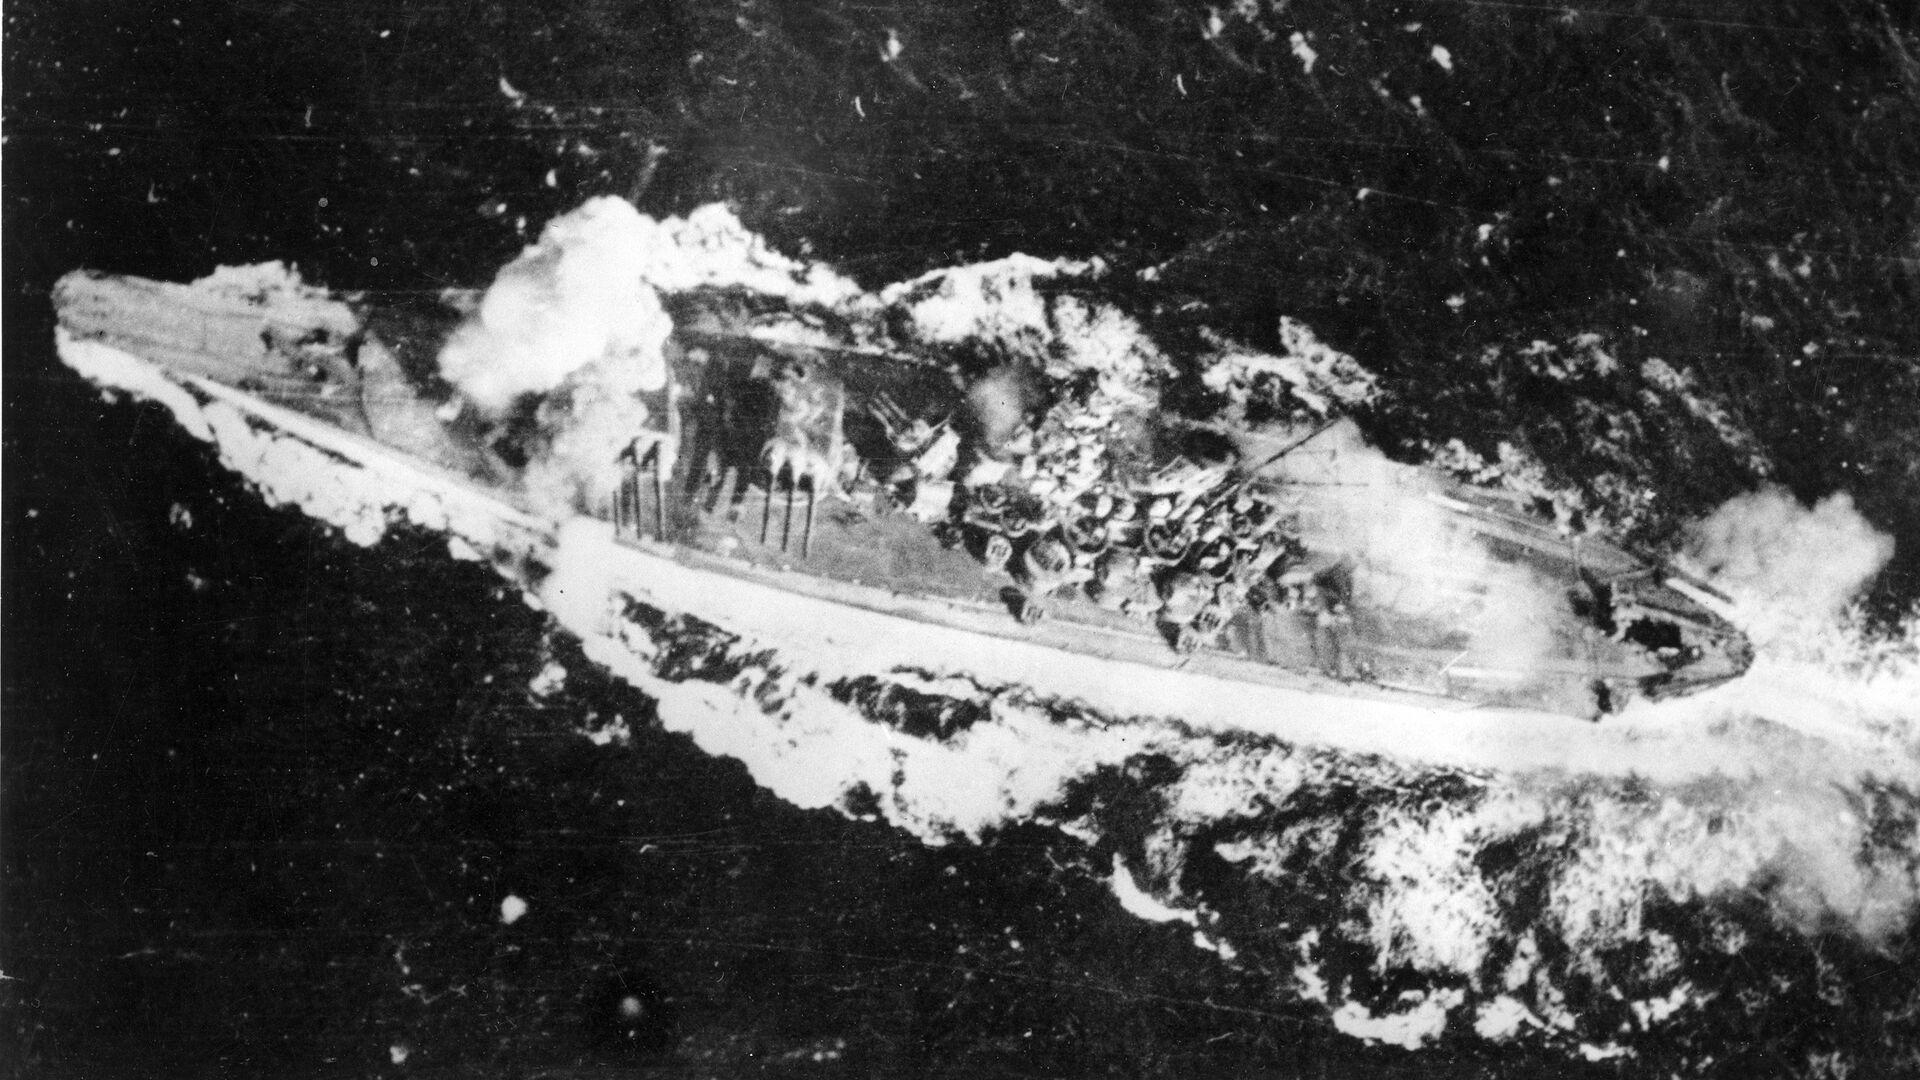 Японский линкор Ямато, попавший под бомбардировку в заливе Лейте - РИА Новости, 1920, 01.04.2021